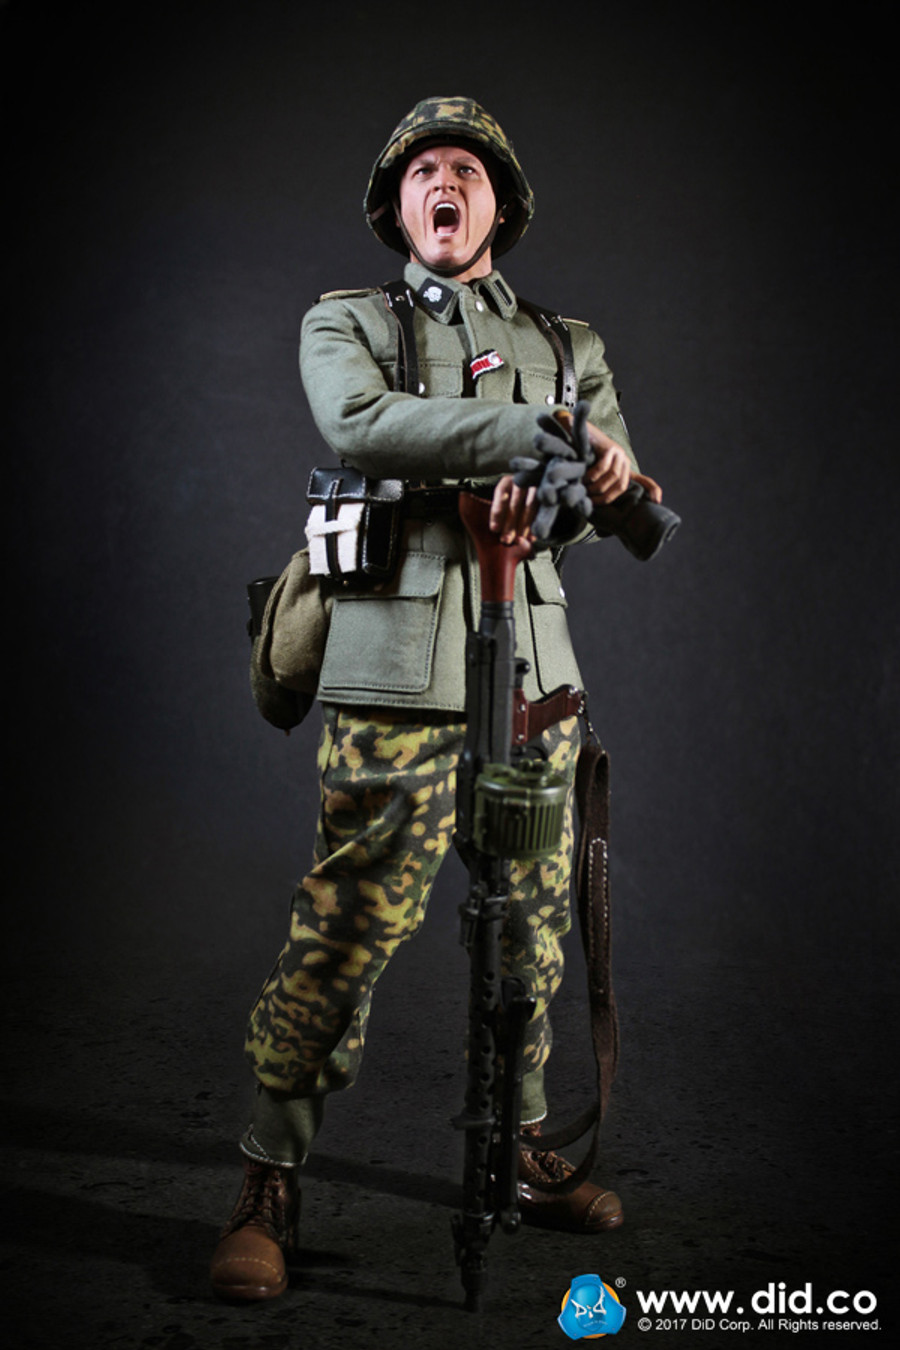 DID - 3rd SS-Panzer-Division MG34 Gunner - Alois